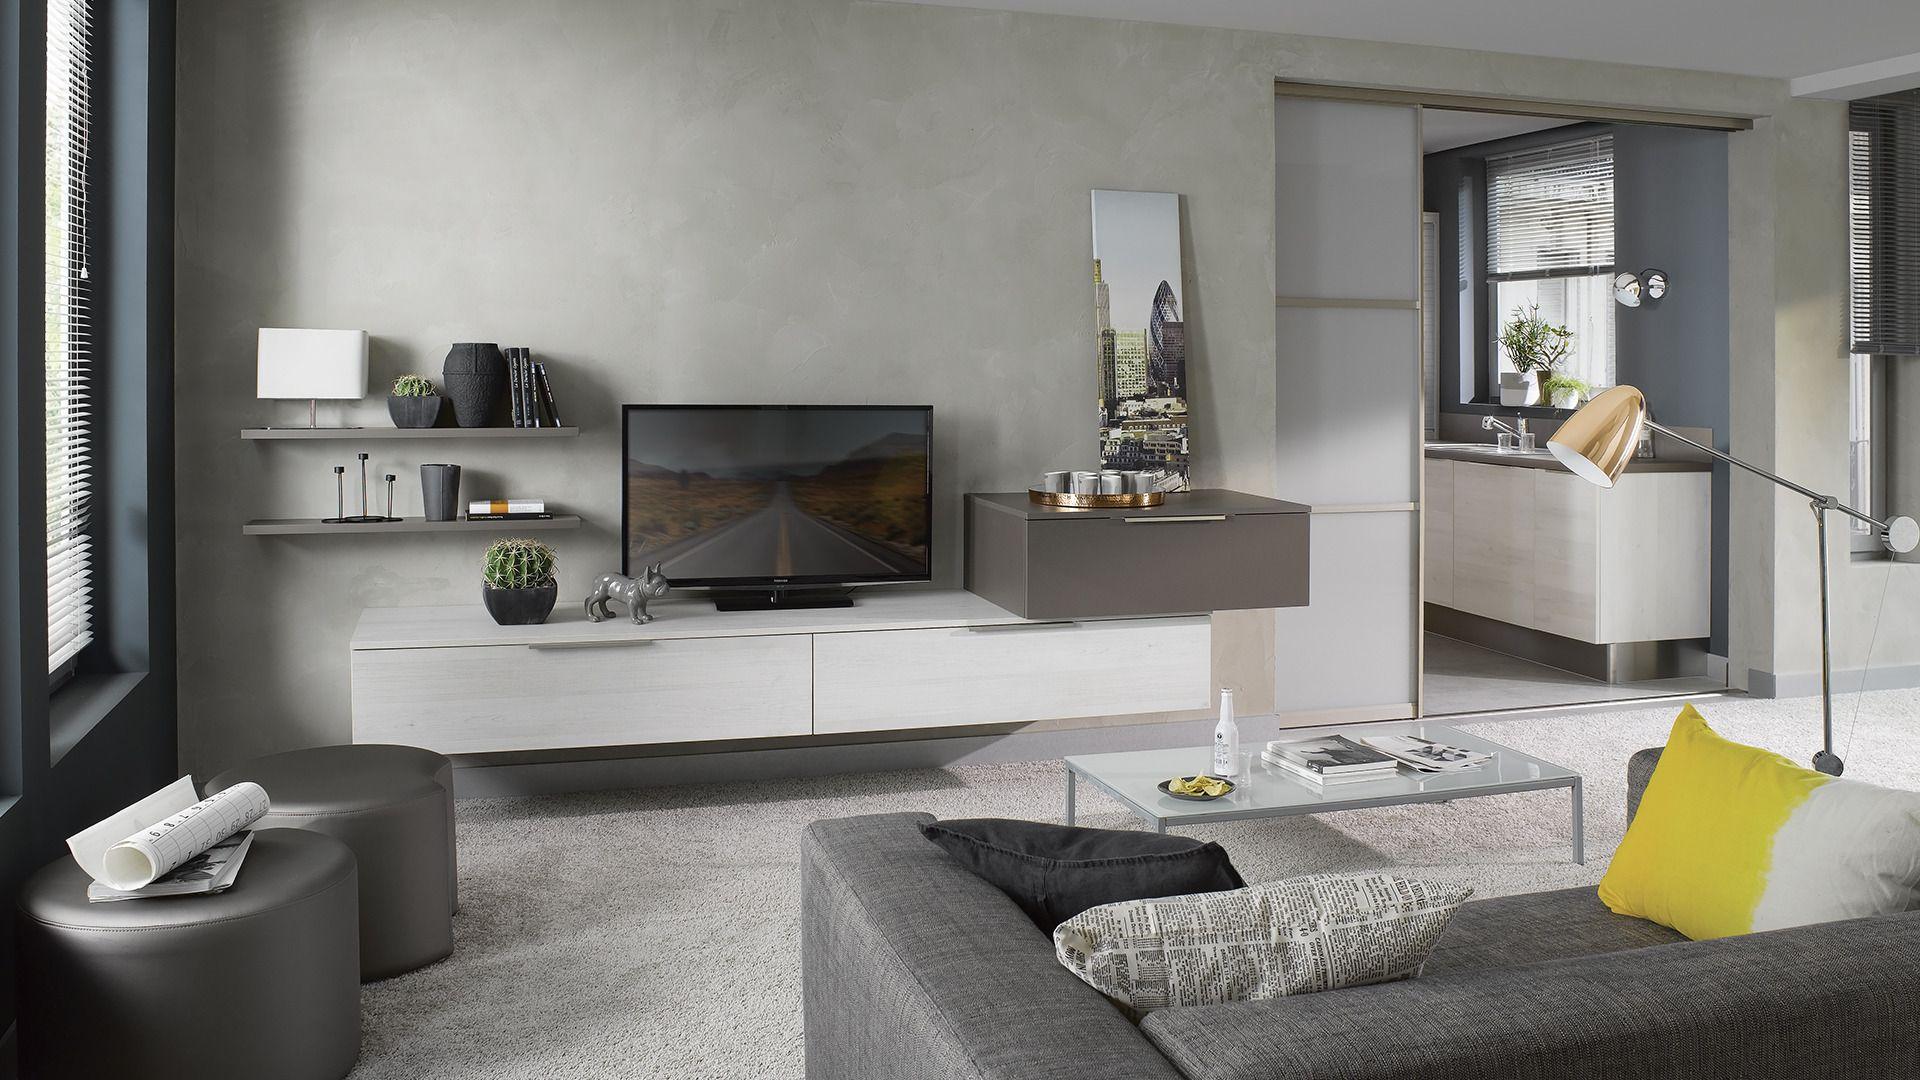 cuisinella com catalogue table de cuisine cuisinella table de cuisine cuisinella modele de. Black Bedroom Furniture Sets. Home Design Ideas